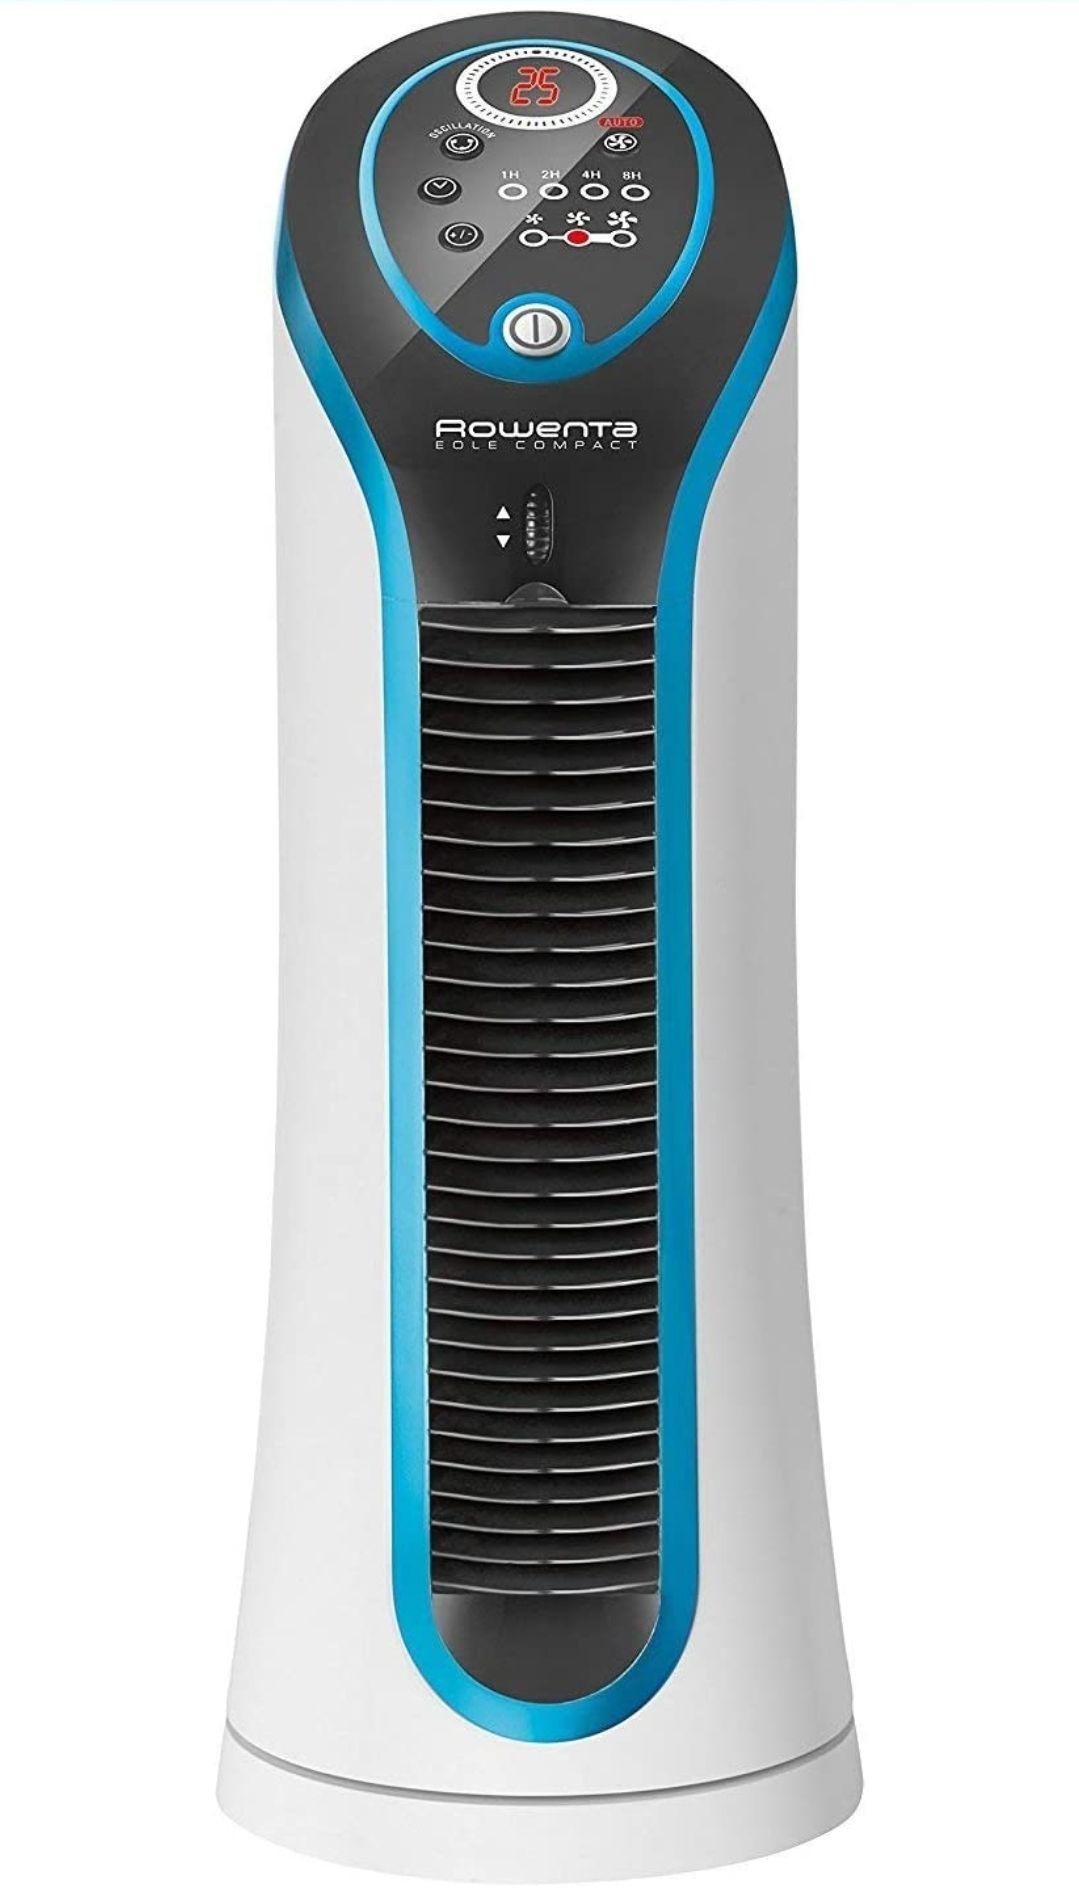 Ventilateur colonne Rowenta Eole Compact VU6210F0